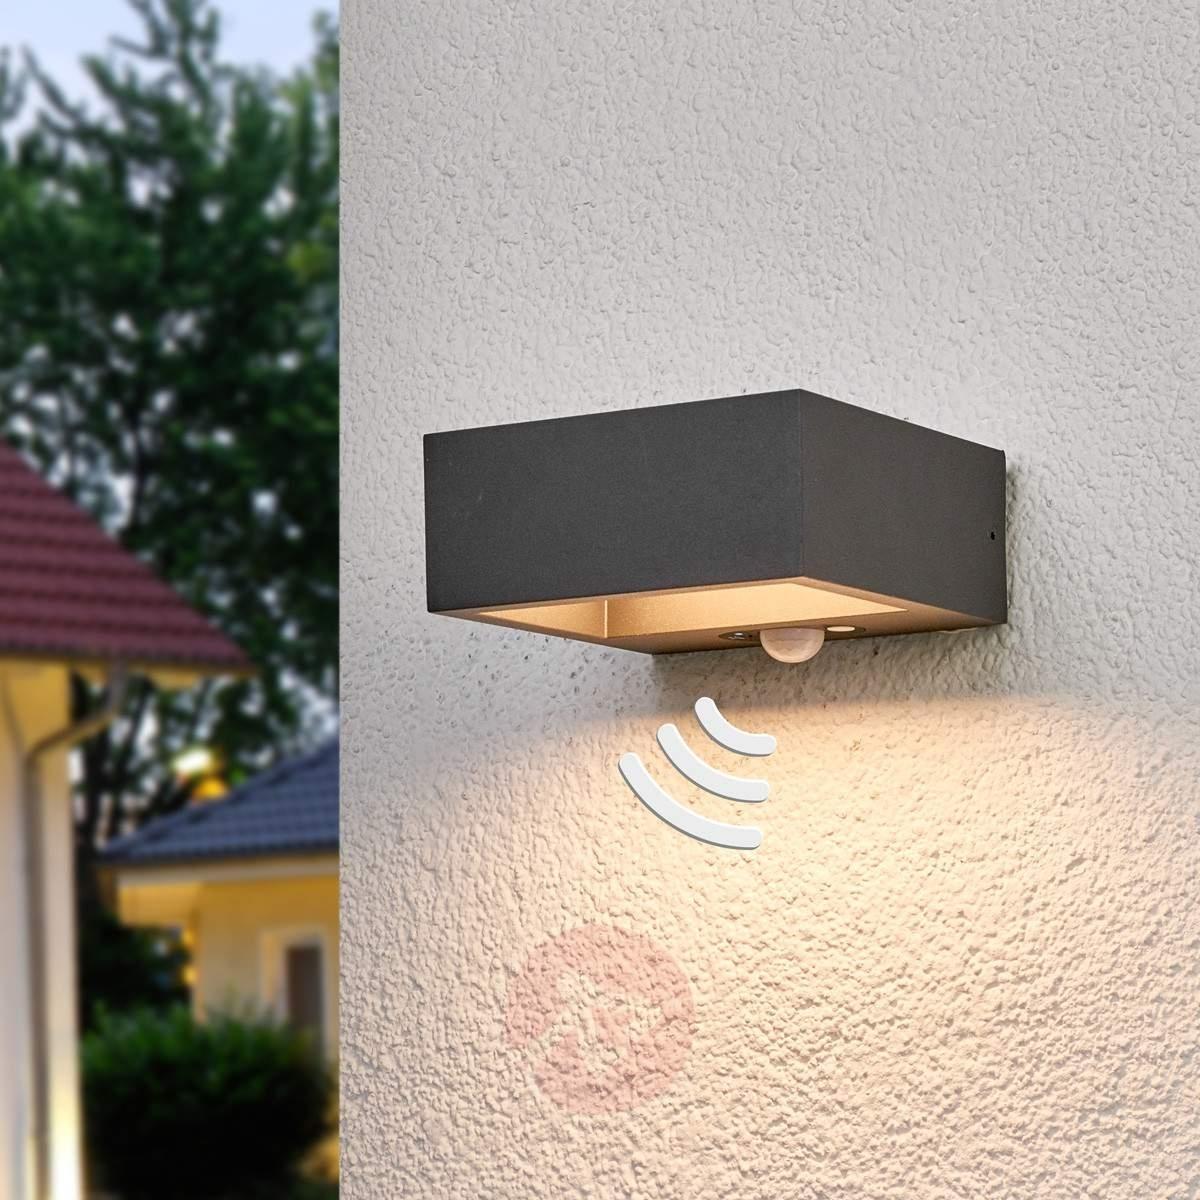 Solar Powered Led Outdoor Wall Light Mahra, Sensor | Lights (#15 of 15)